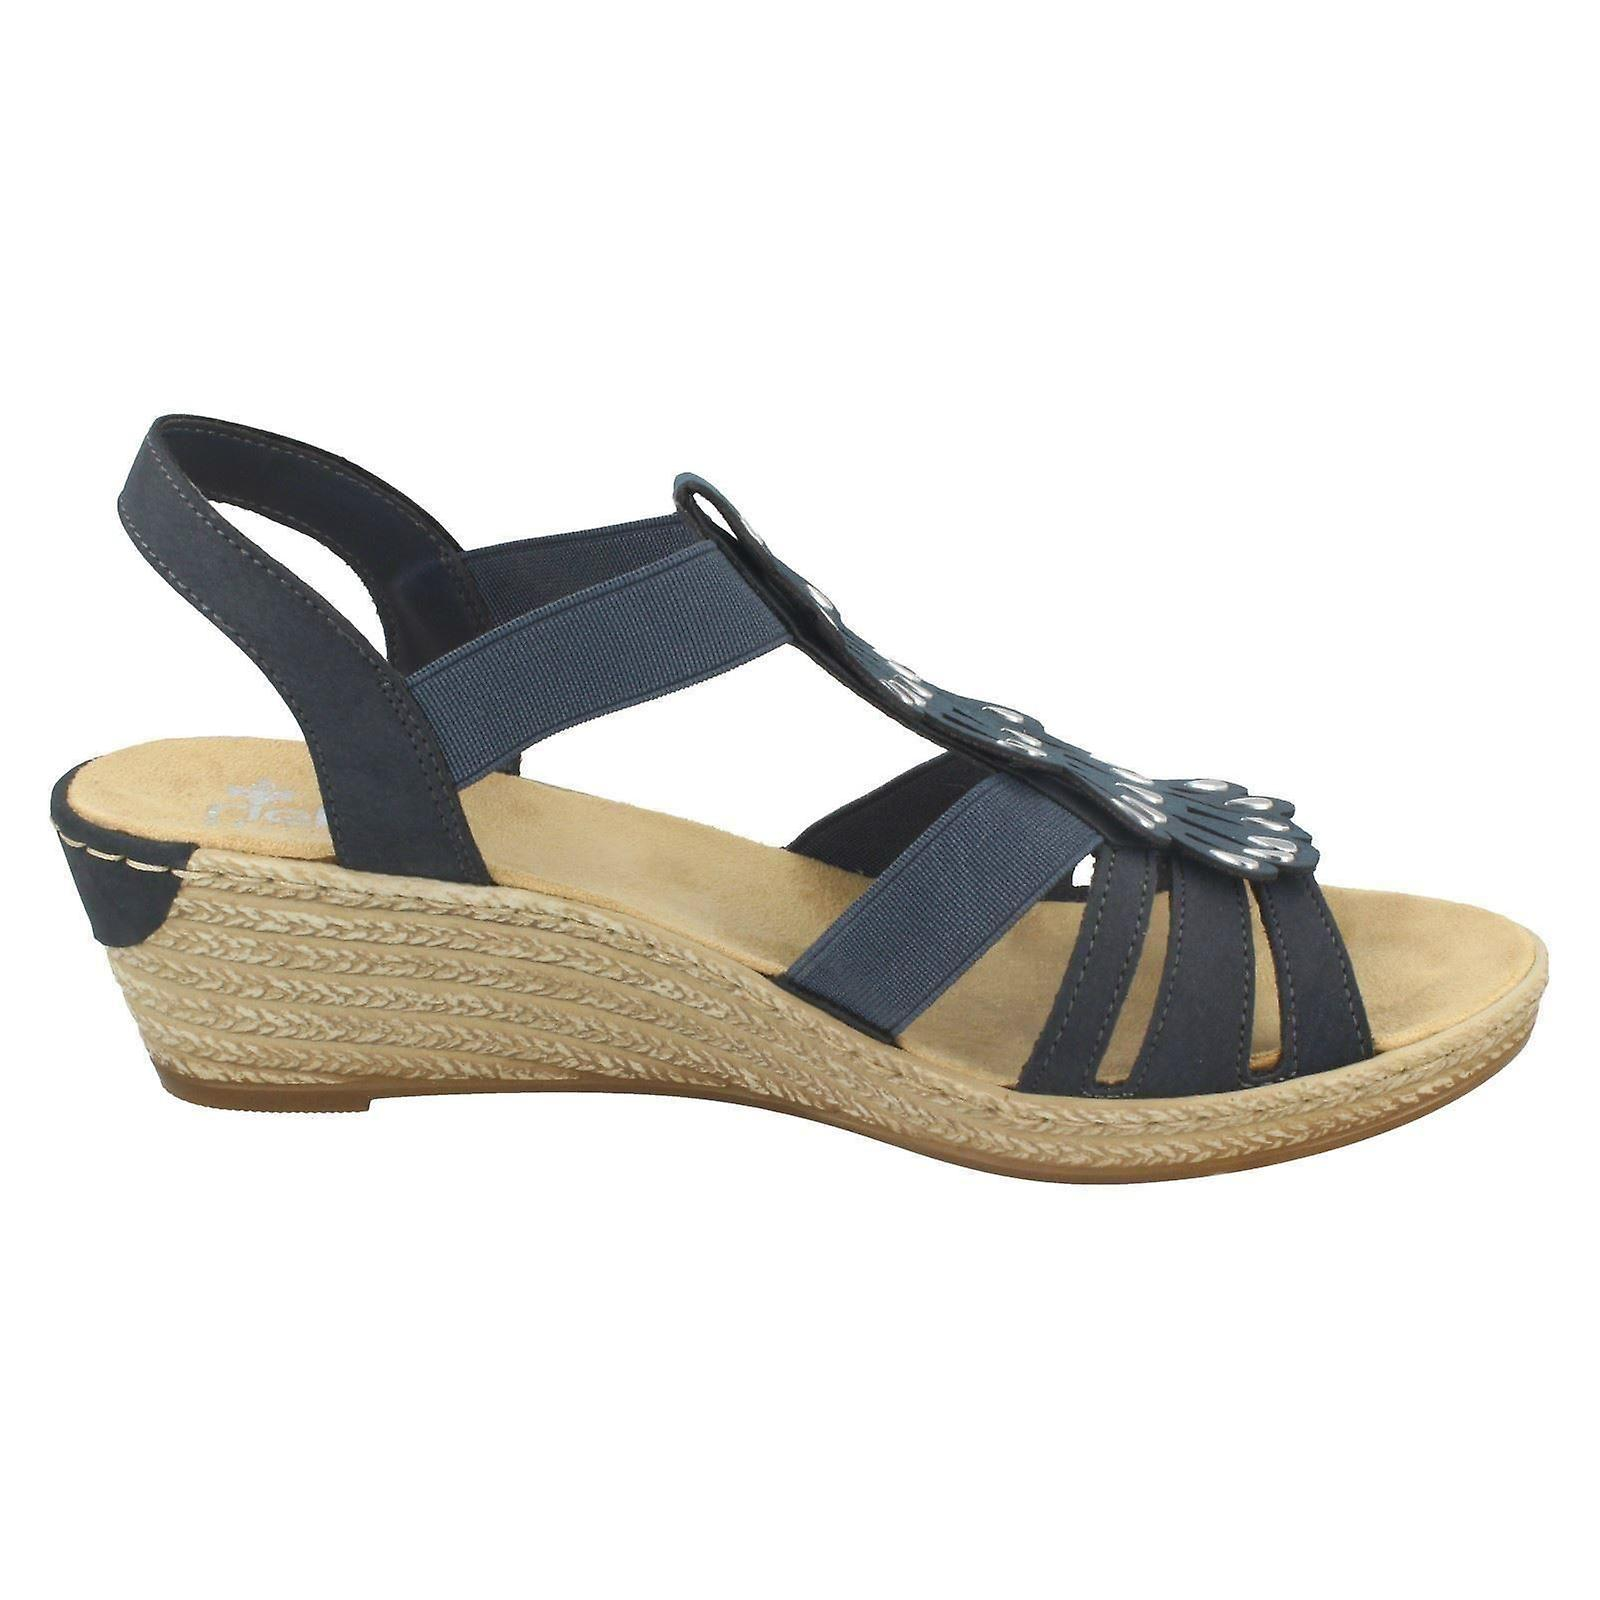 Damen Rieker Wedge Heel Sandalen 62436 14 blaue Kunststoff UK Größe 8 EU Größe 42 US 10